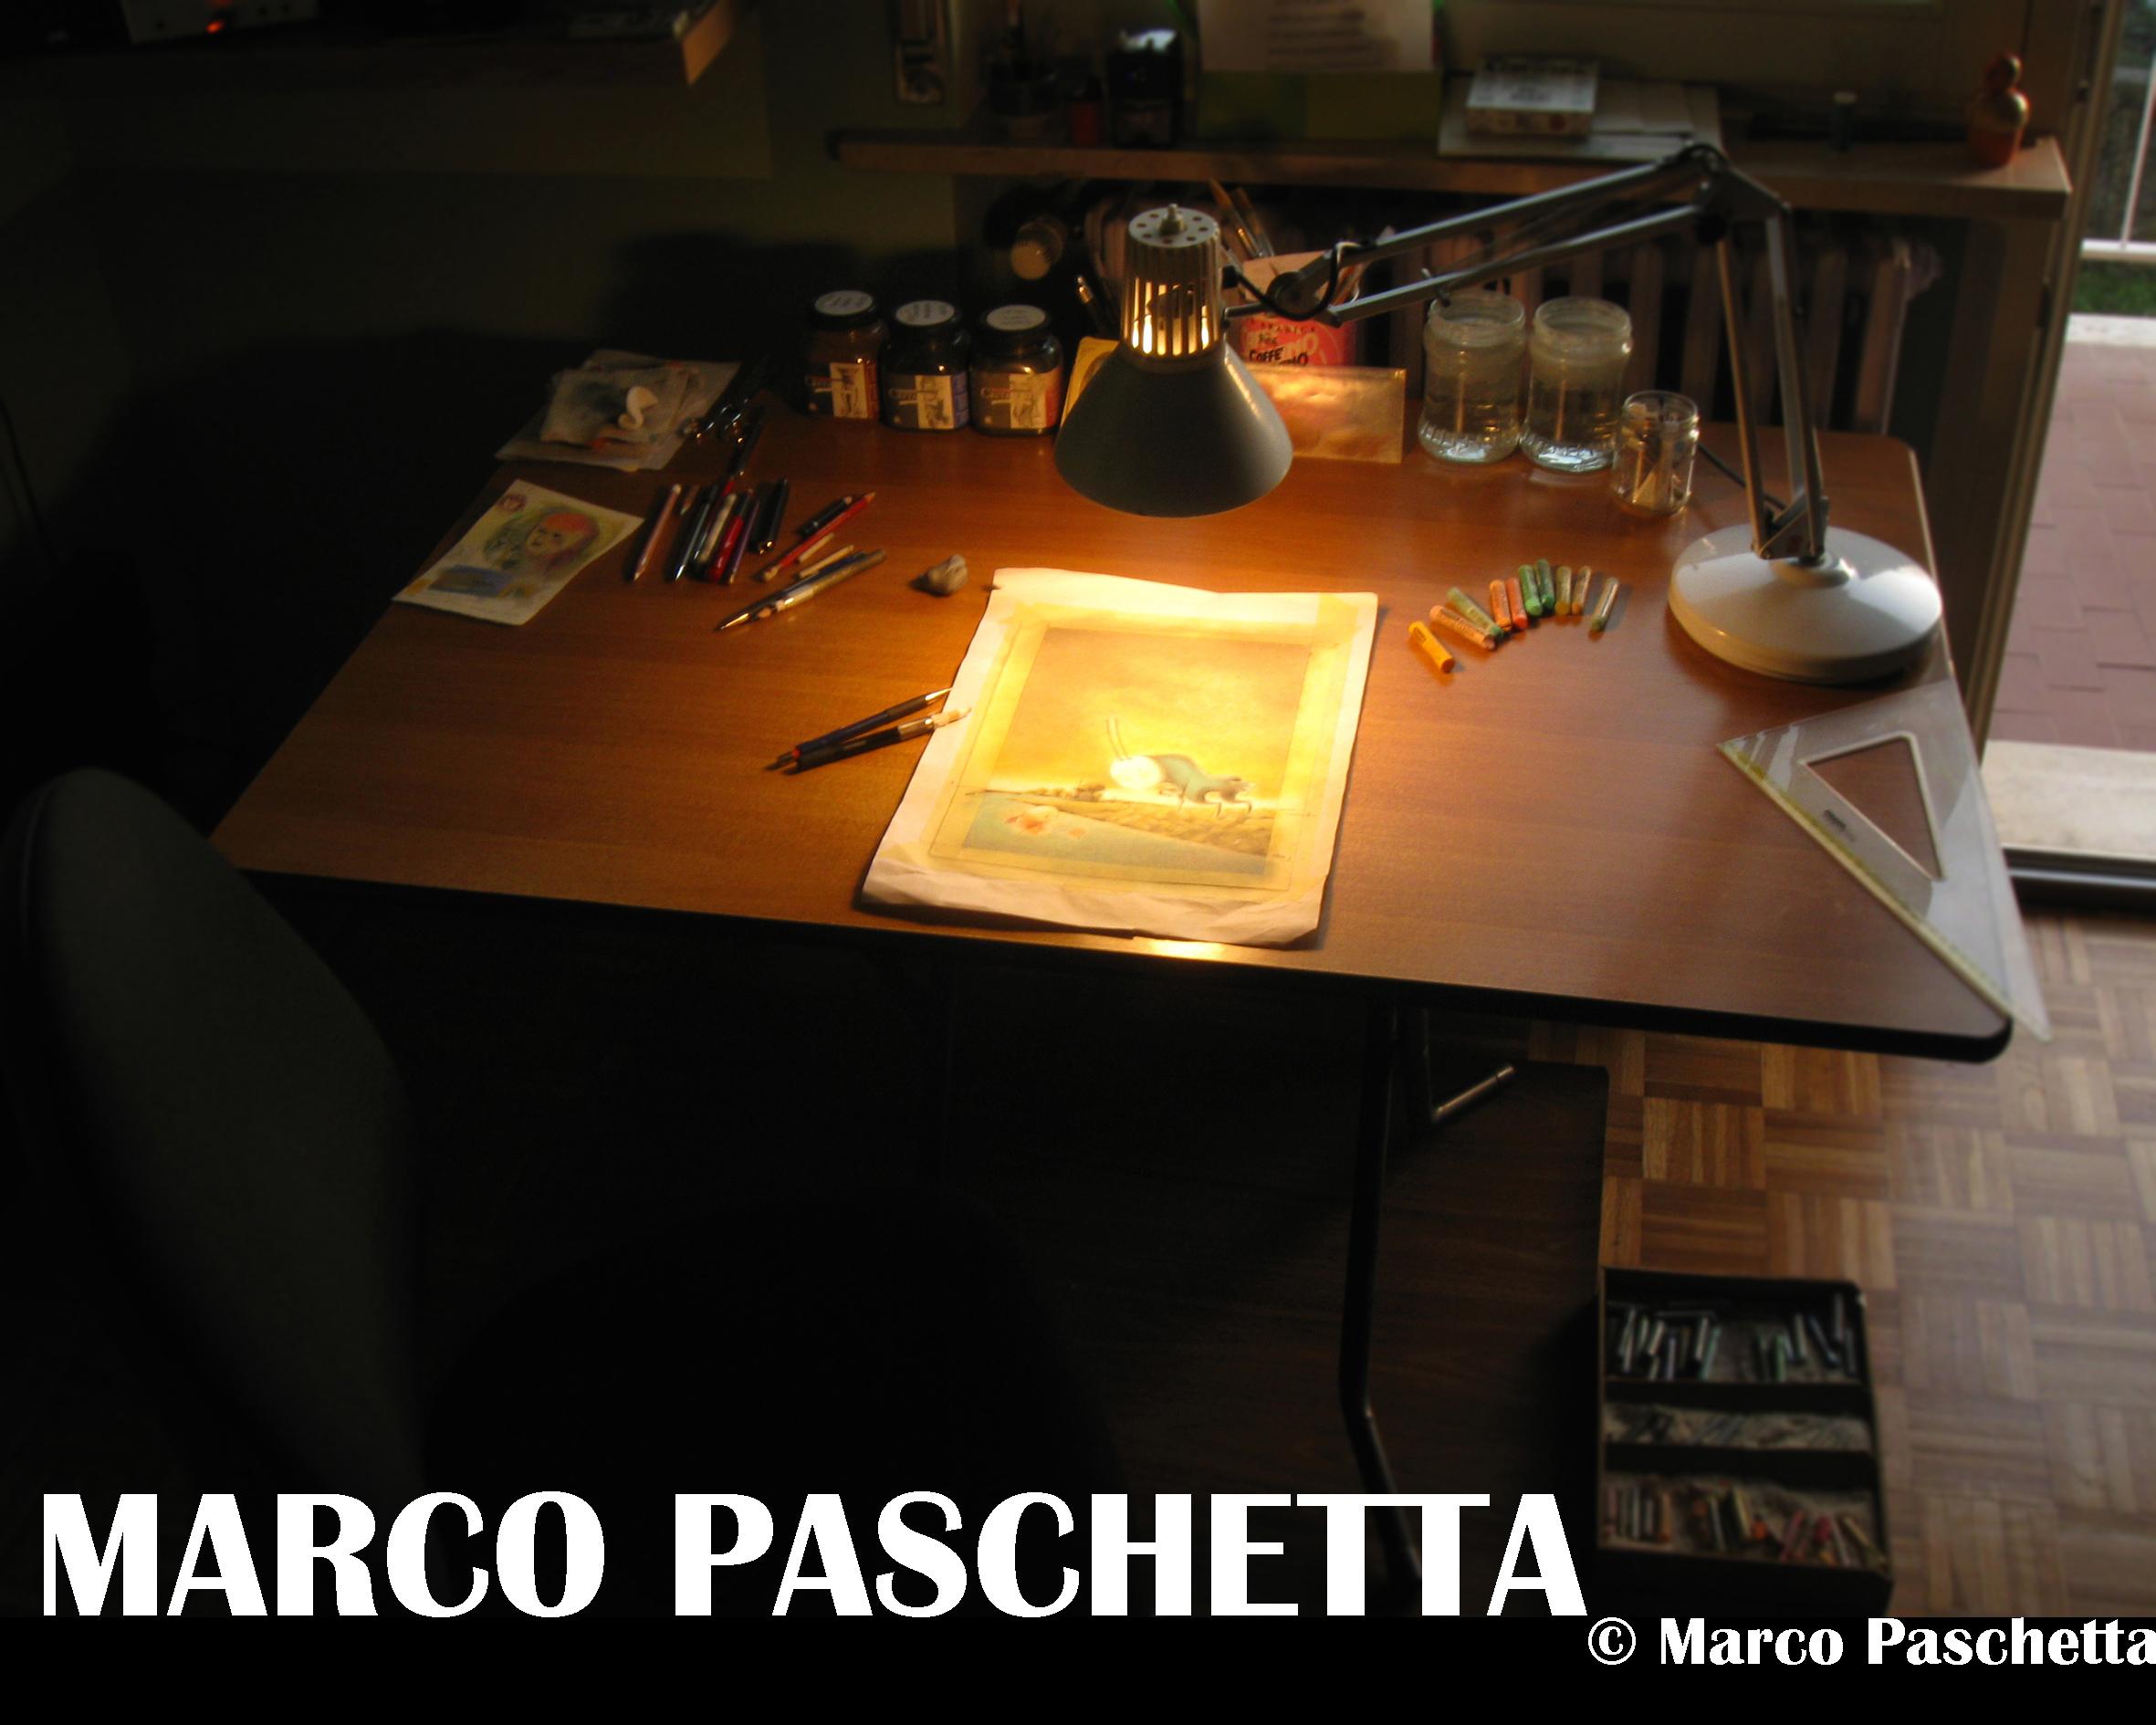 Marco Paschetta